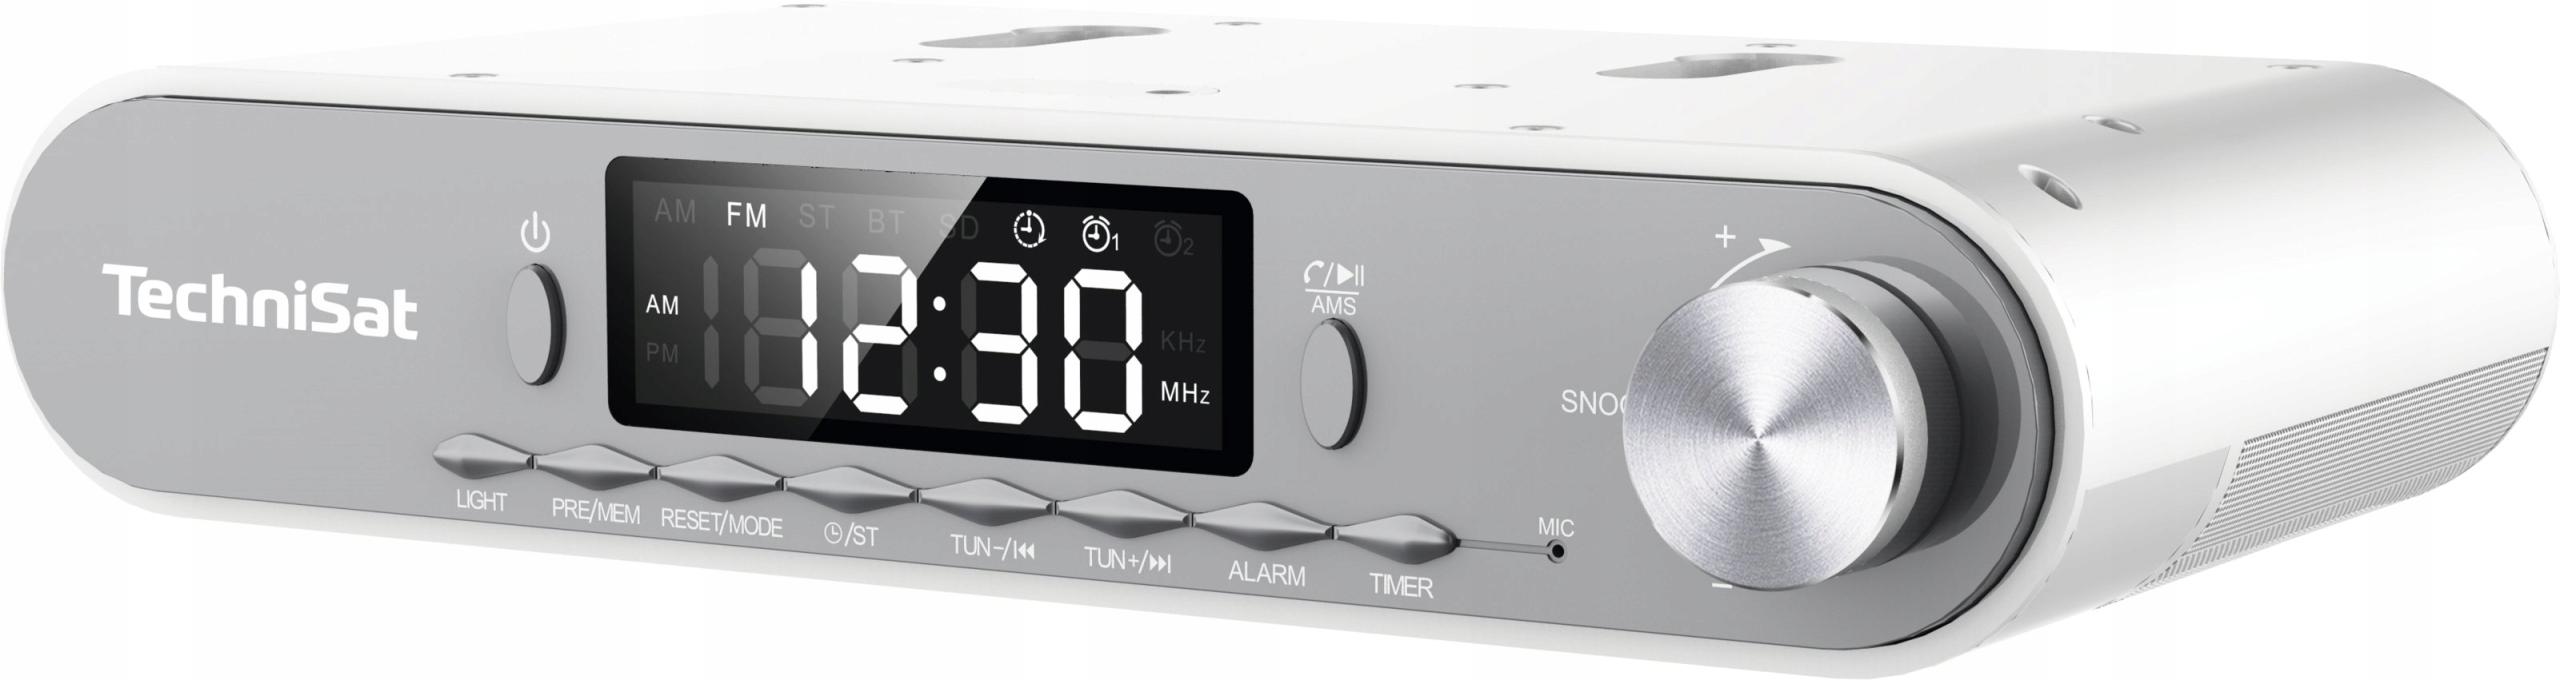 Radio kuchenne FM,bluetooth podszawkowe TechniSat